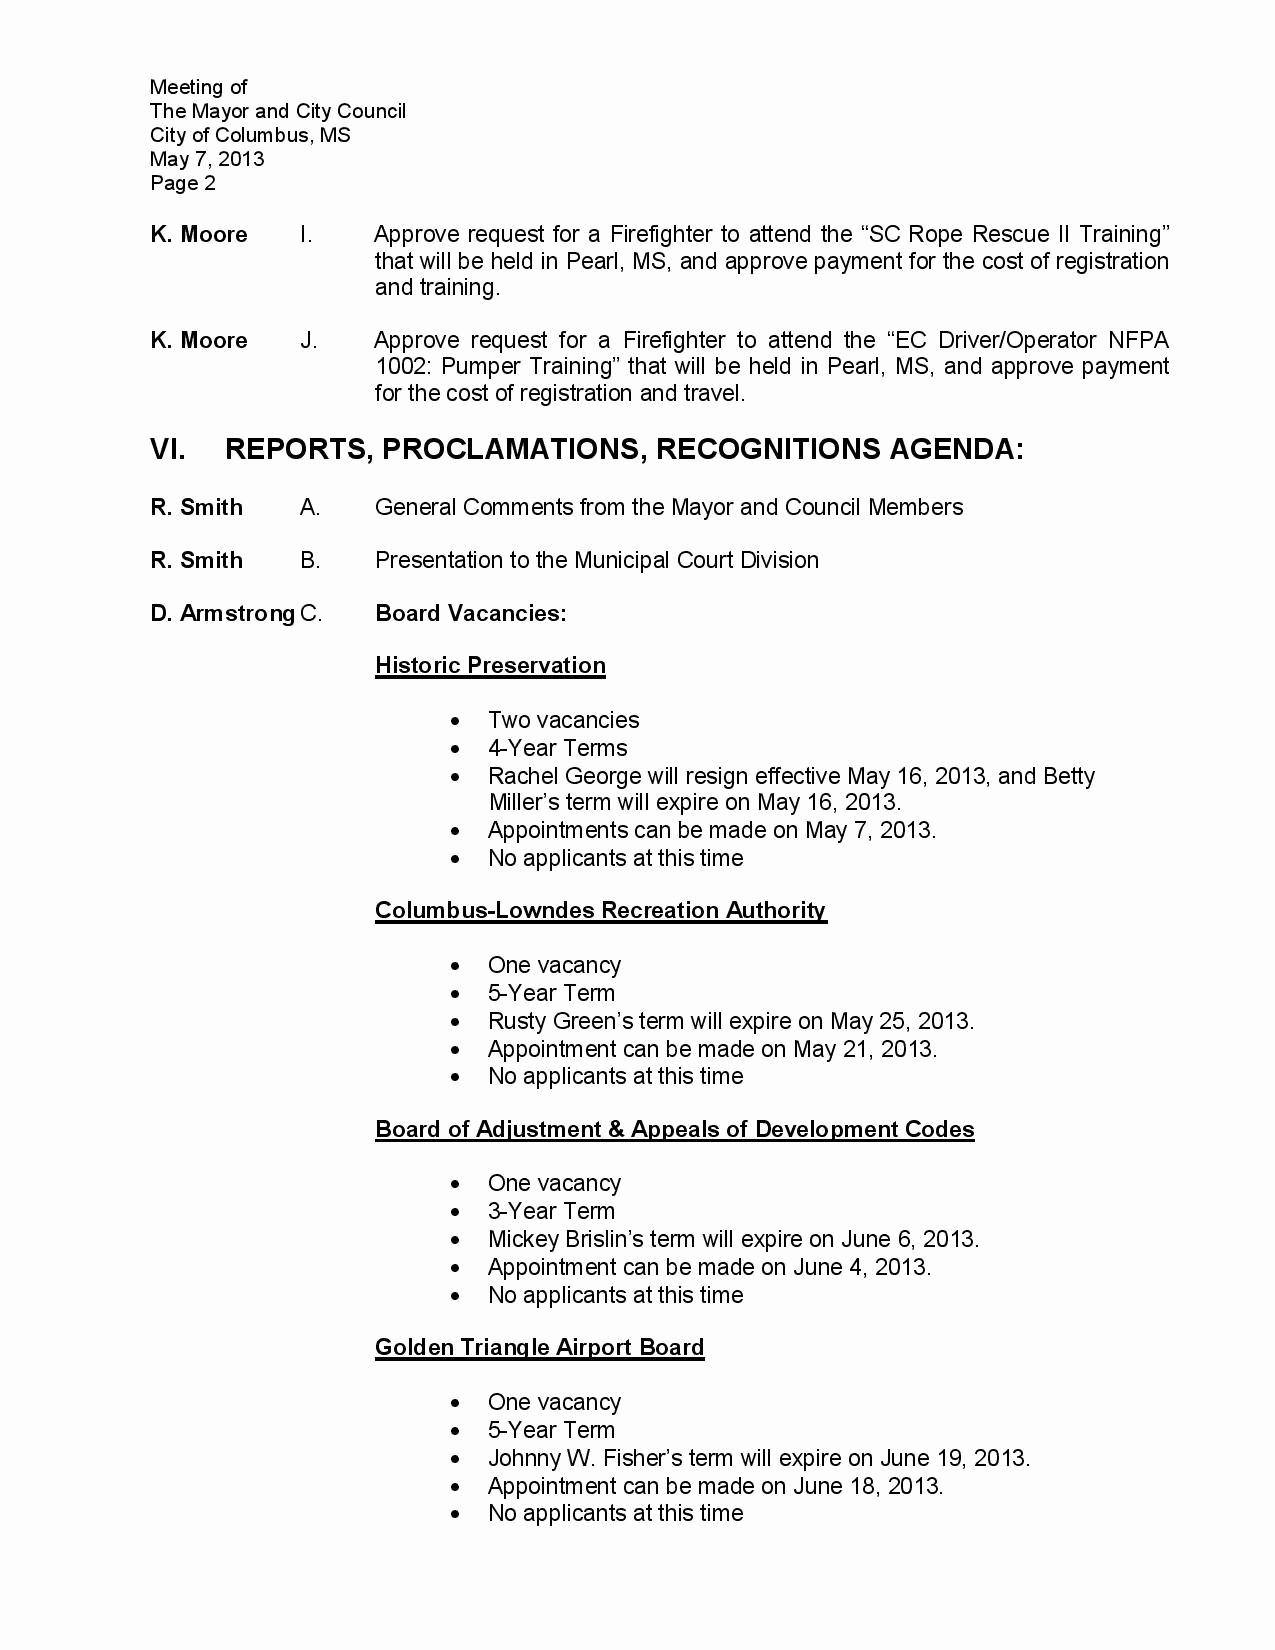 Town Hall Meeting Agenda Template Best Of 9 Best Of Copy A Meeting Agenda Client Meeting